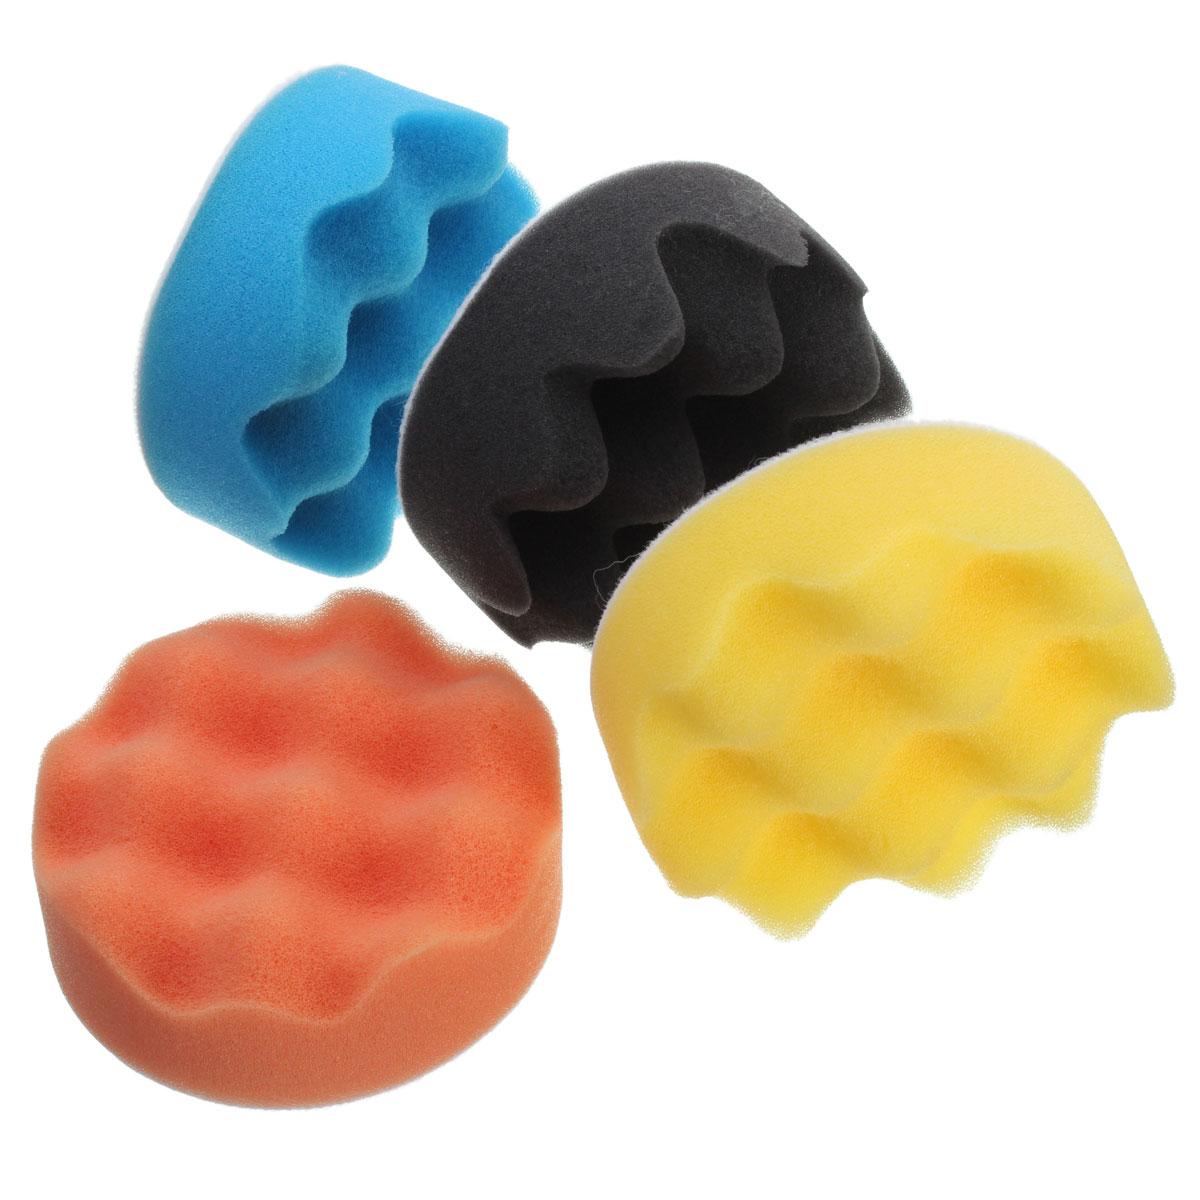 4Pcs 3/4/5/6/7 Inch Buffing Polishing Sponge Pads Kit For